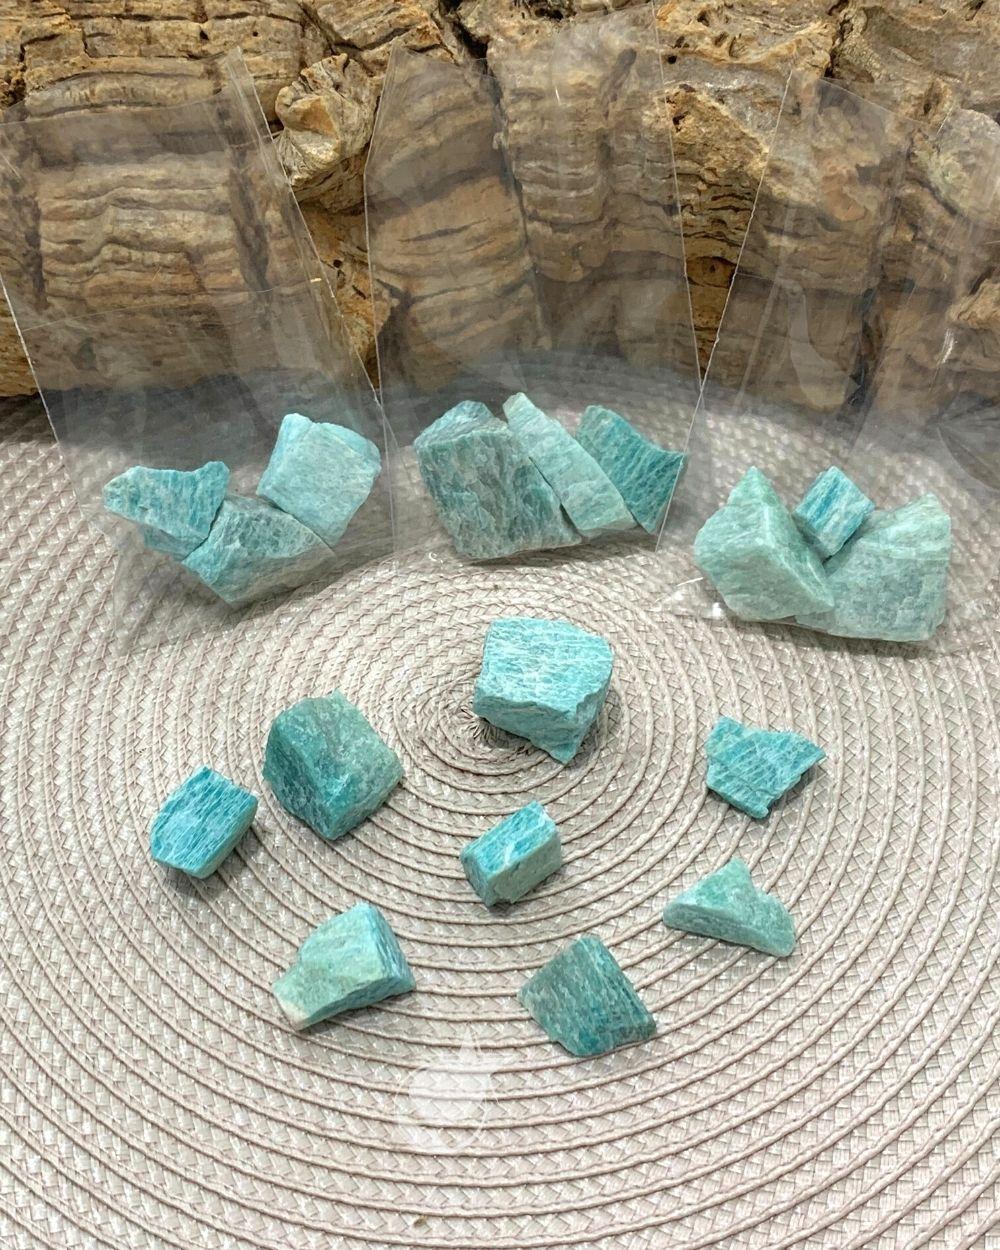 AMAZONITA BRUTA - PACOTE 30g -  3 a 4 pedras - PEDRA DO ANO 2021